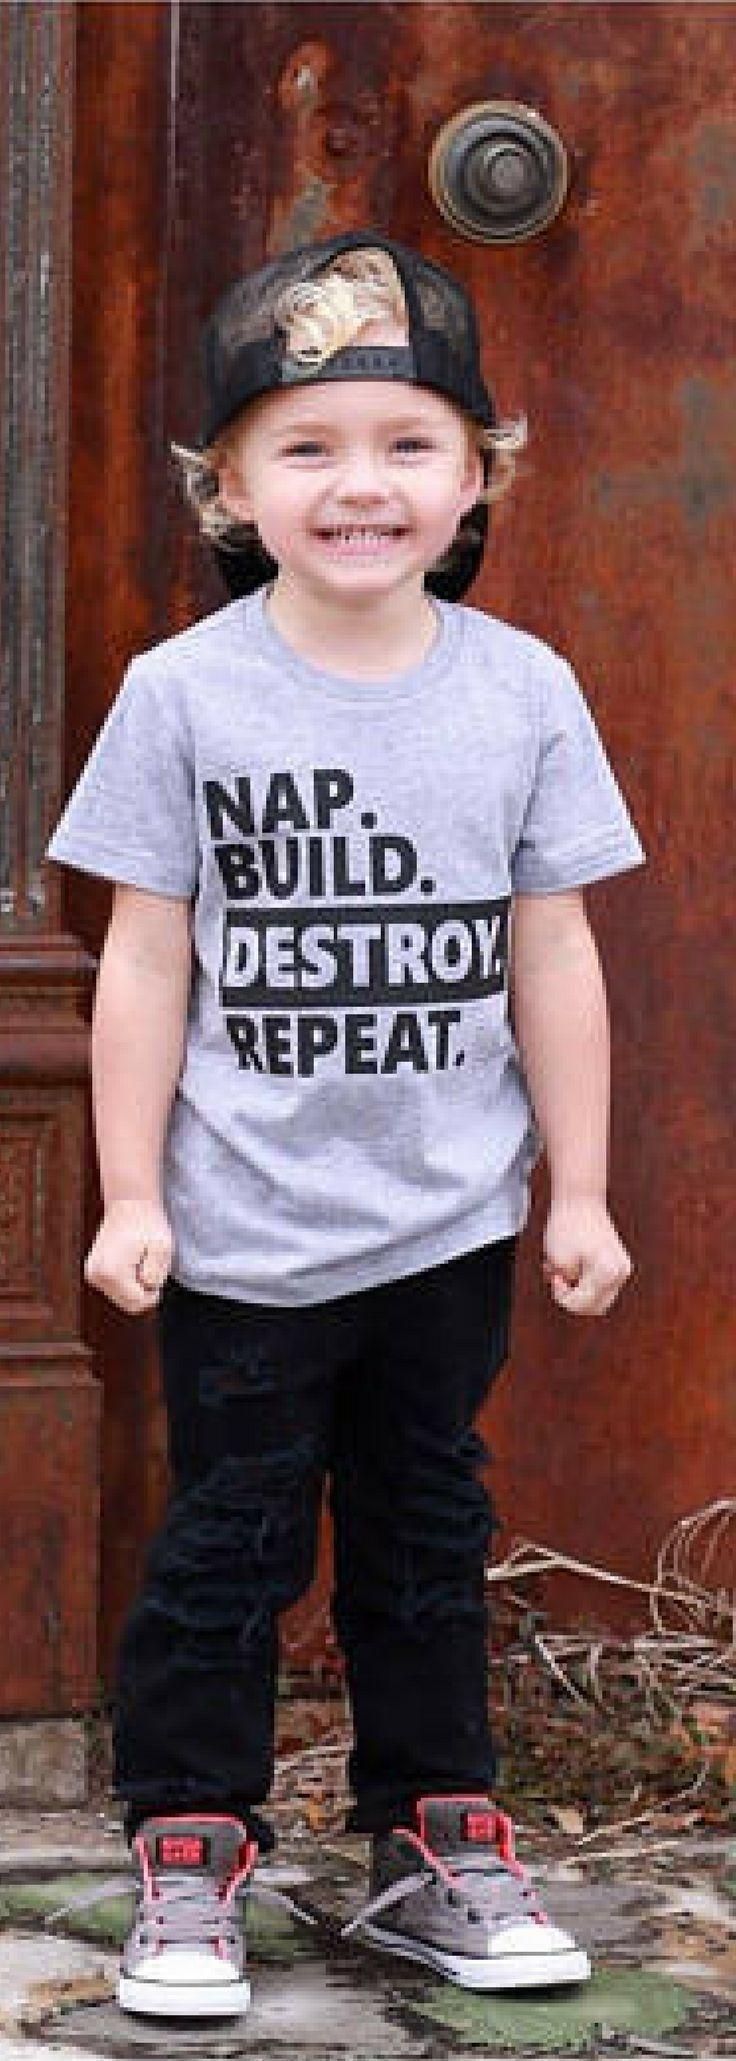 Nap Build Destroy Repeat, Mama's Boy Shirt, Baby Shirt, Toddler Shirt, Shirt for Boys, Funny Baby, Cute Boy Shirt, Trendy Boy, Boys Shirt, Kids Fashion, Kids Outfits #ad #kidoutfits